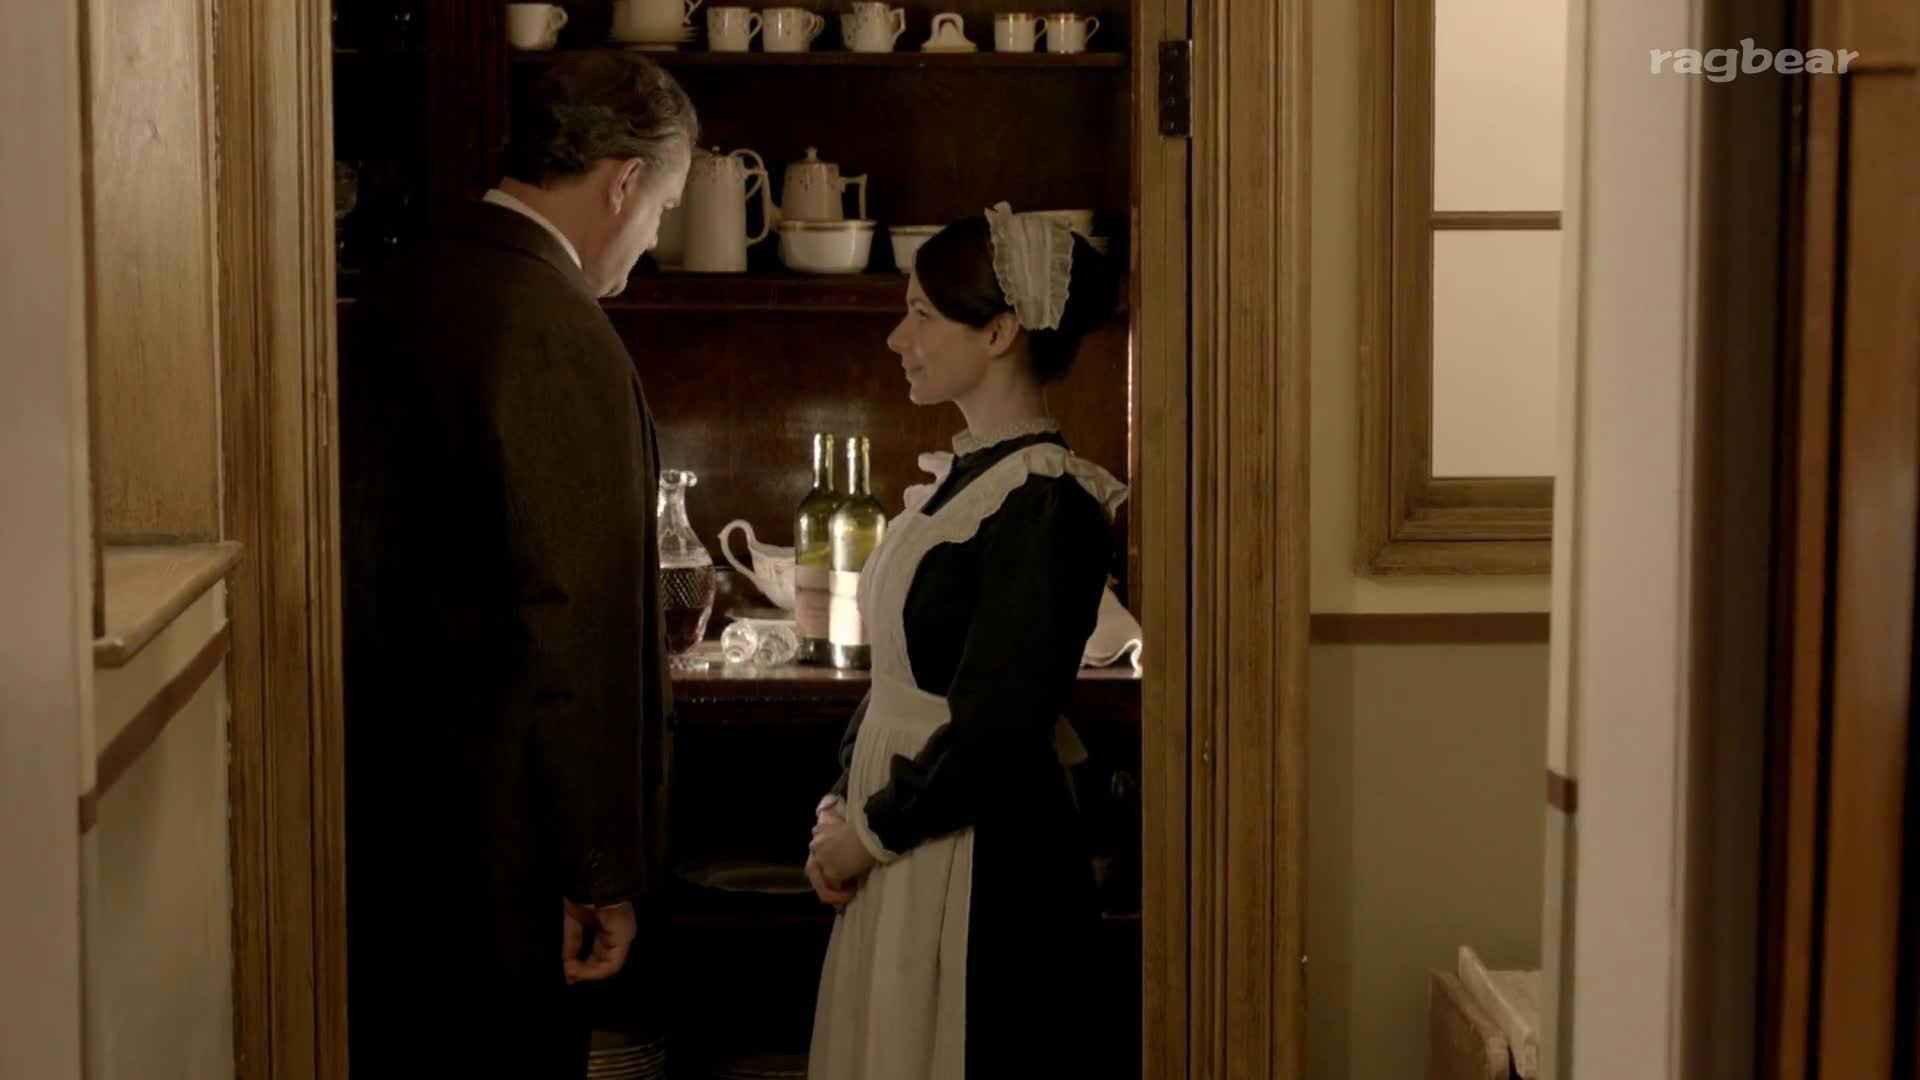 唐顿庄园/Downton Abbey